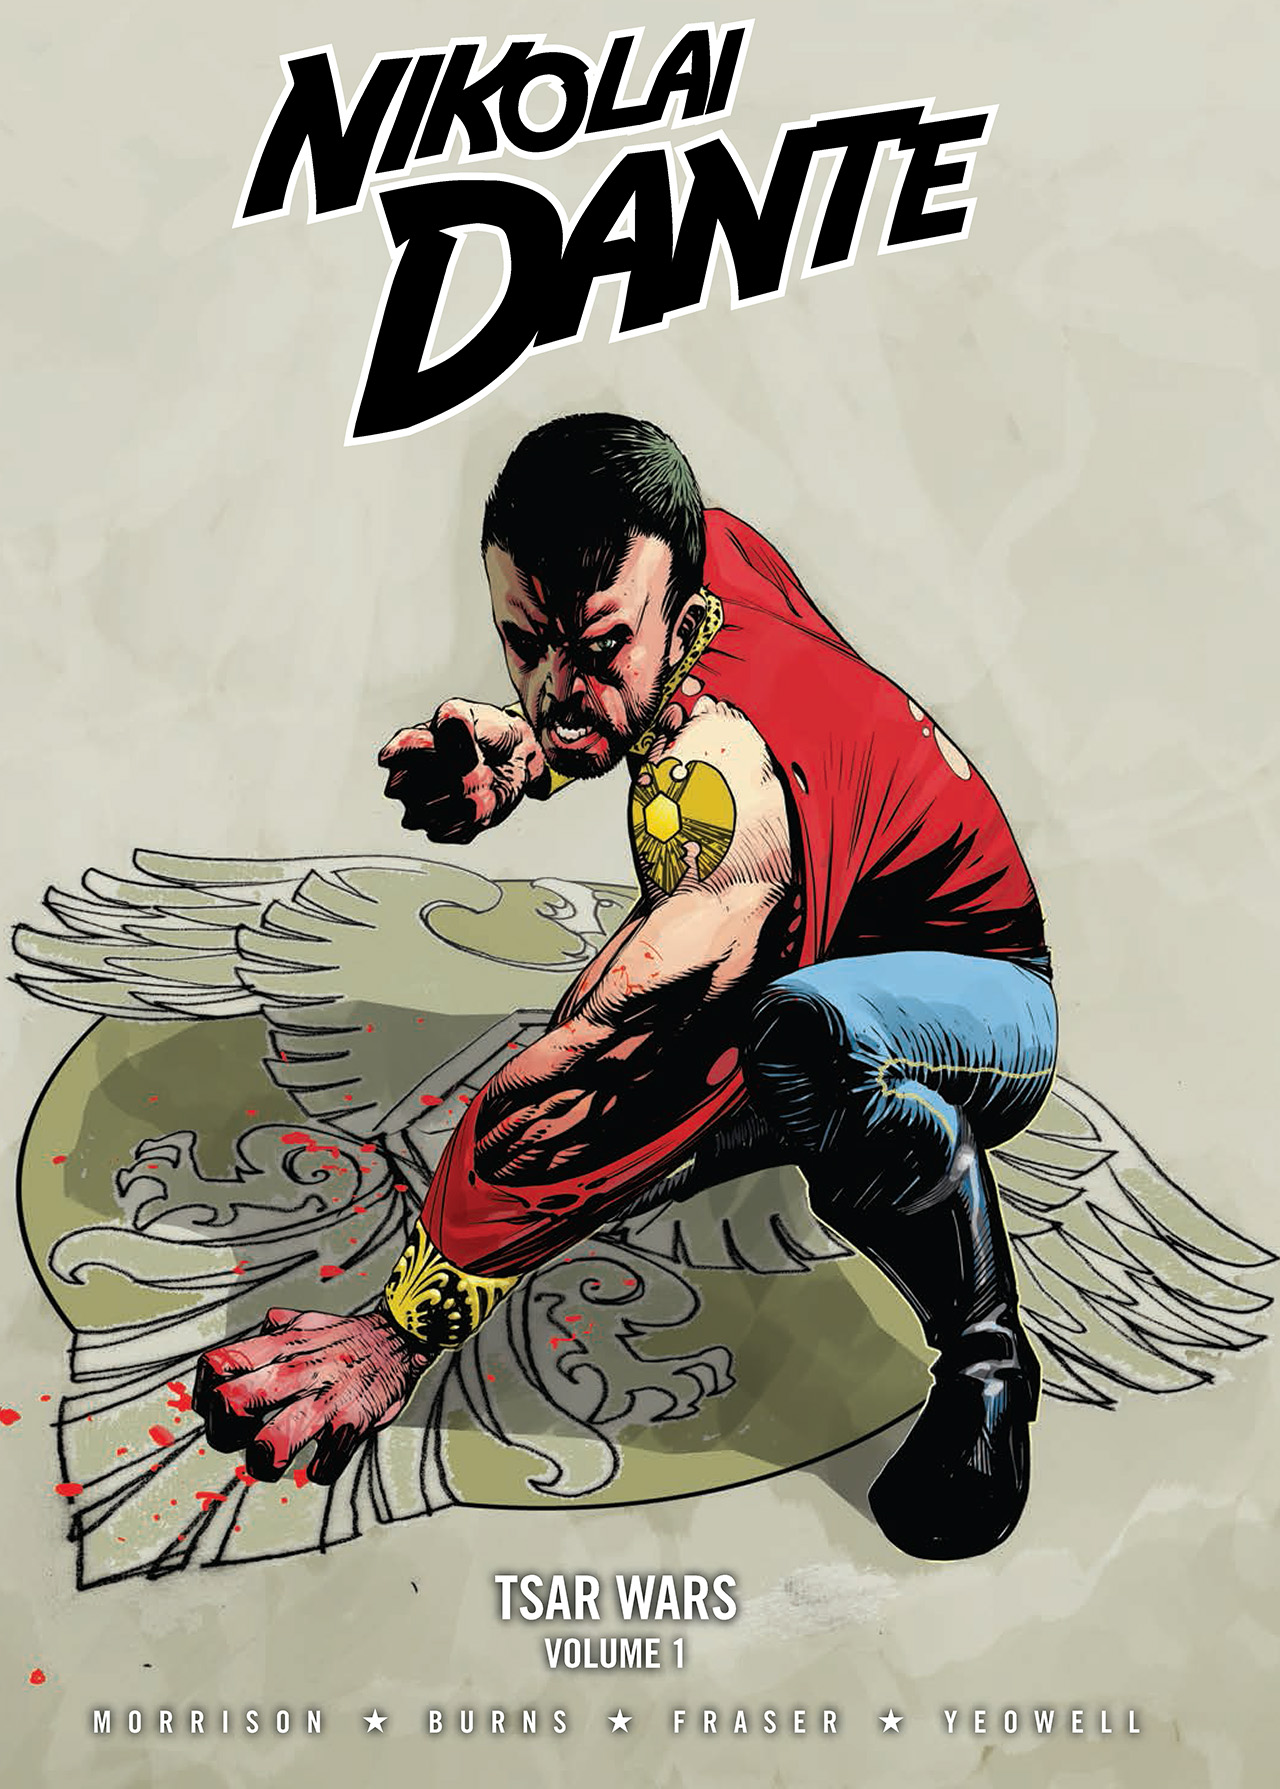 Read online Nikolai Dante comic -  Issue # TPB 4 - 1